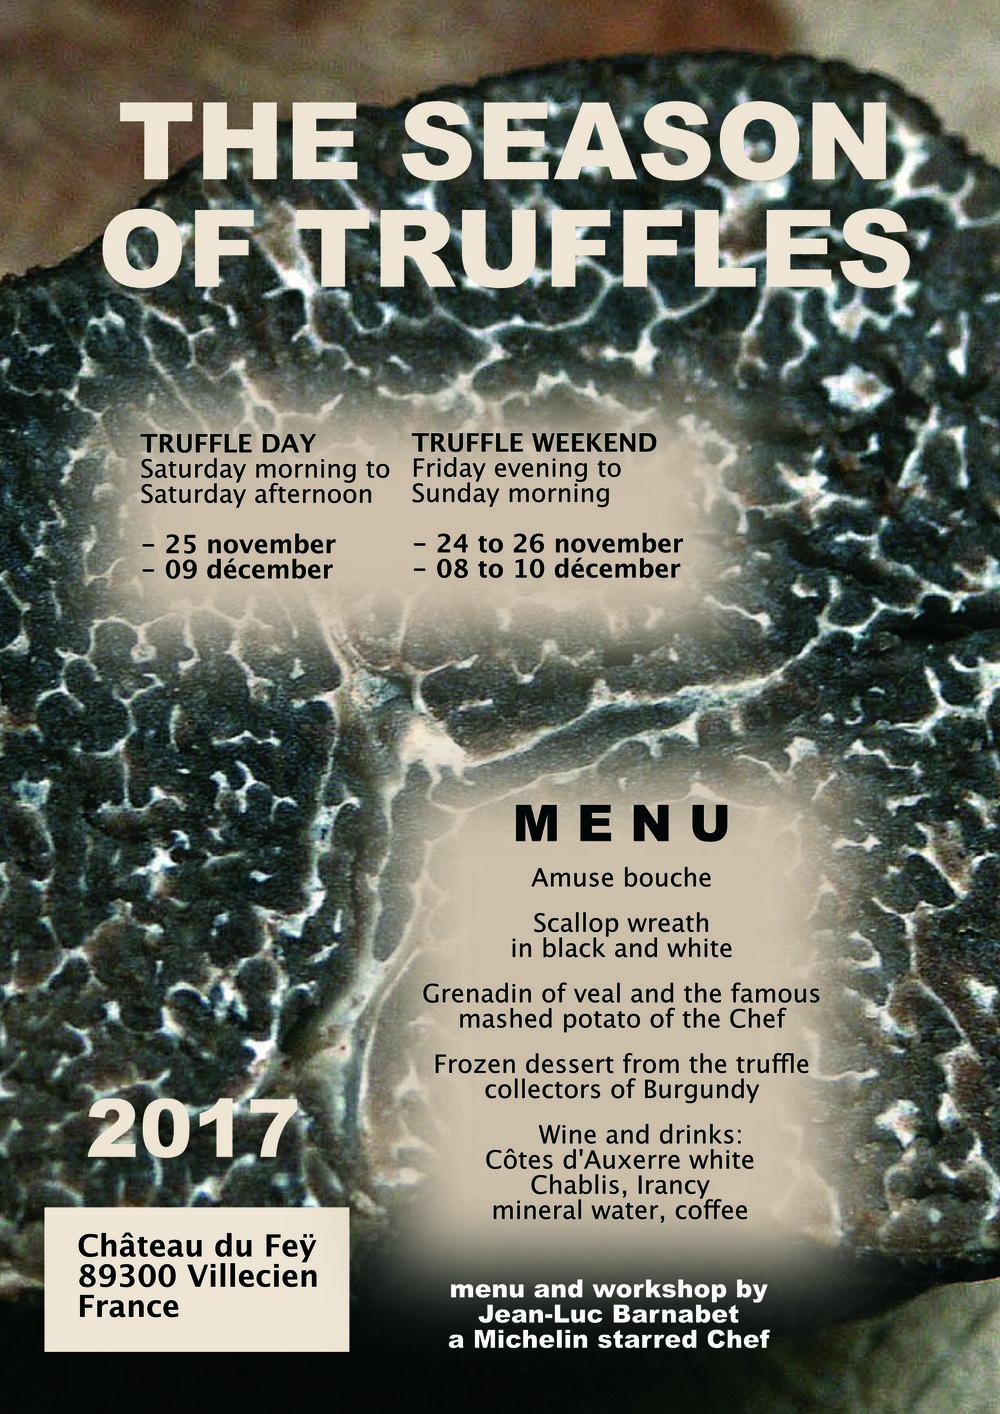 Discovering truffles 01.jpg